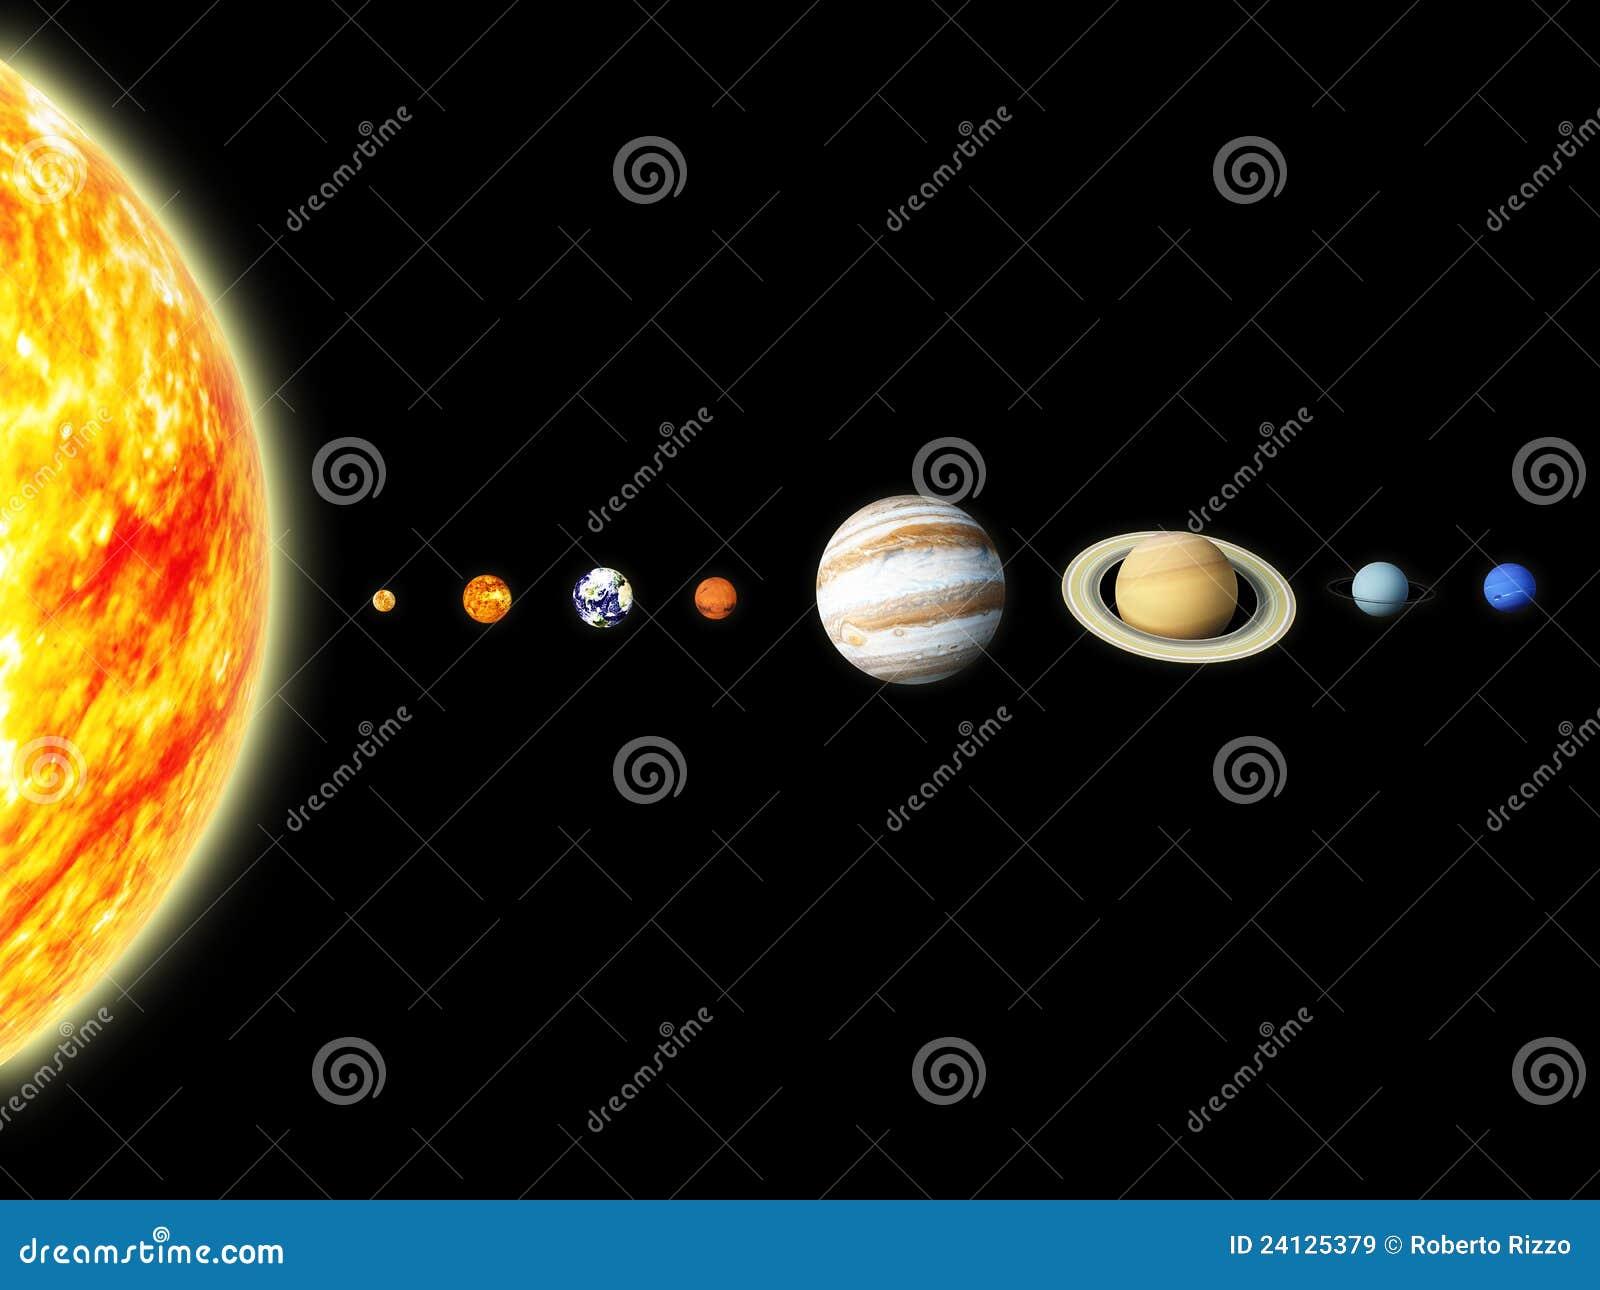 solar system map 3d - photo #5